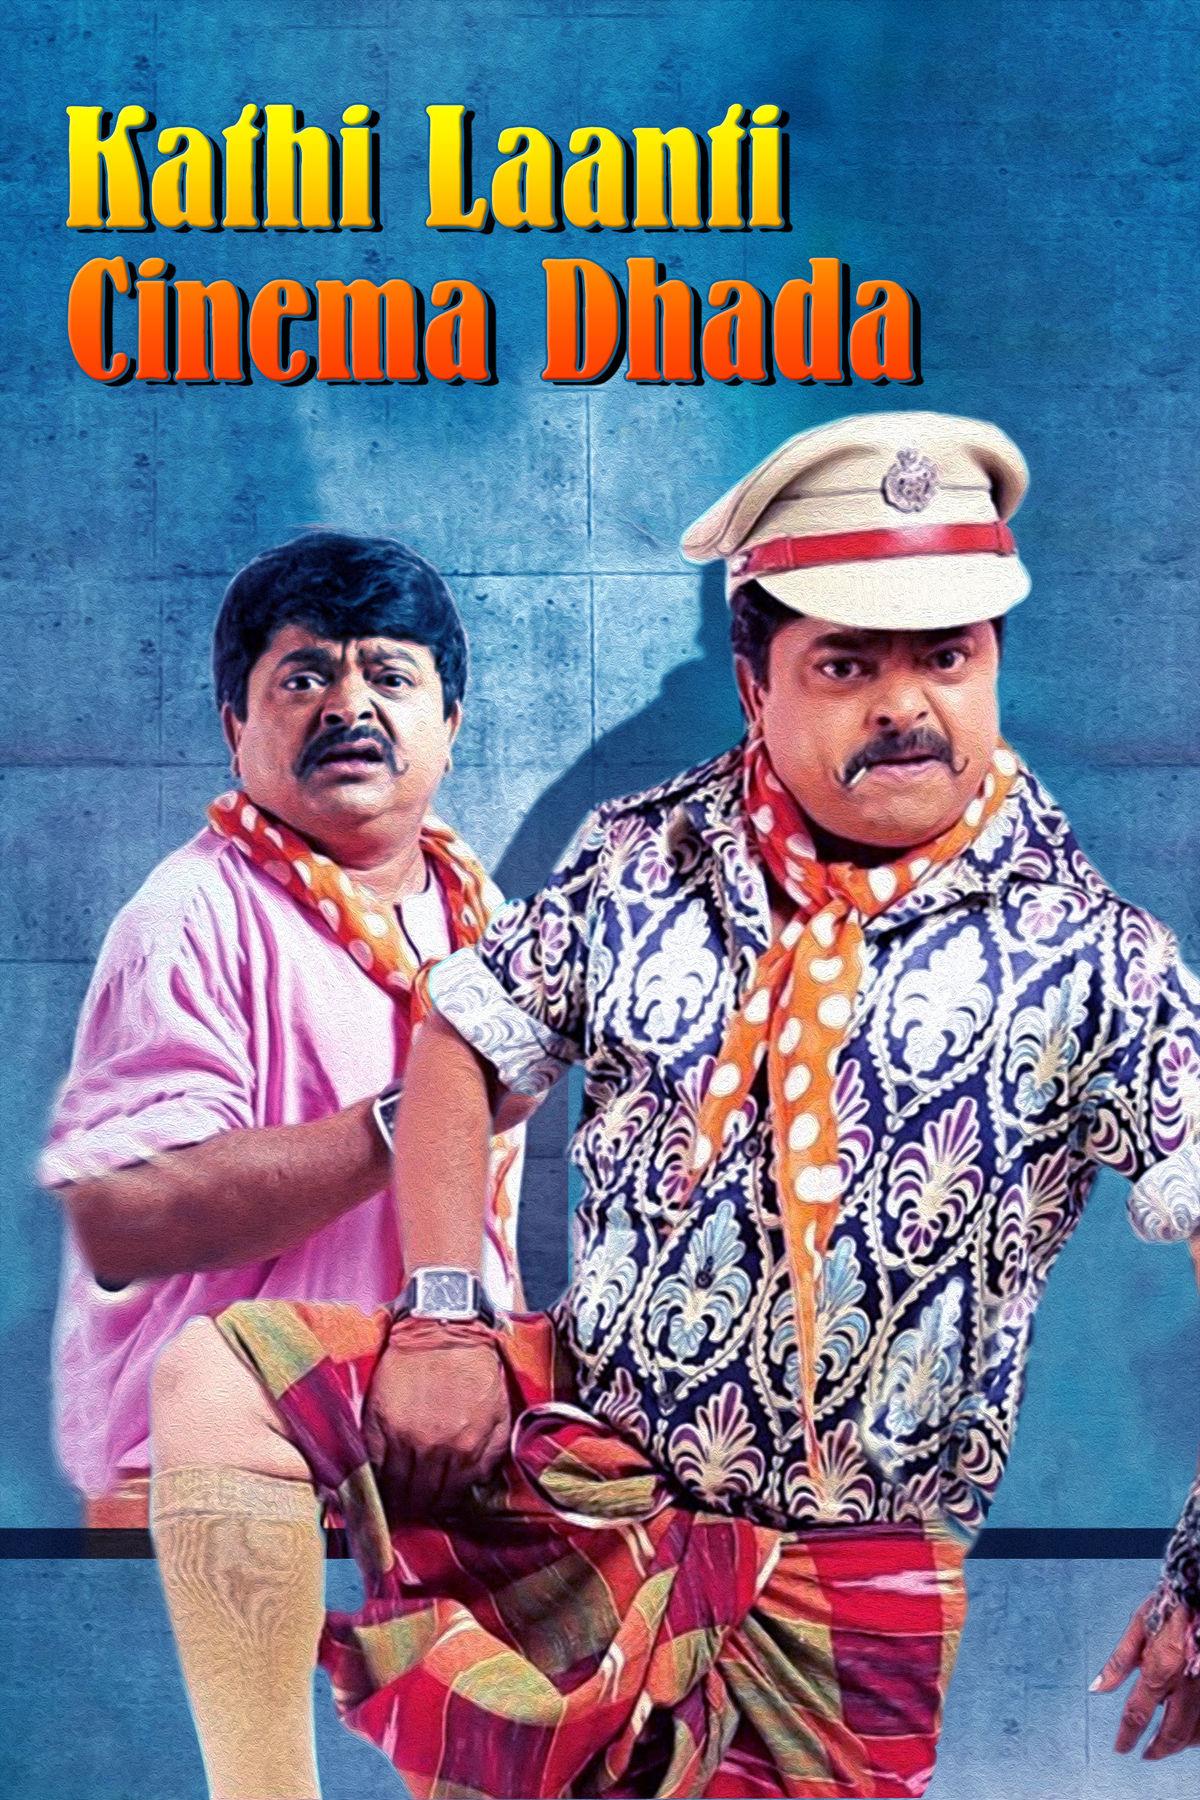 Kathi Laanti Cinema Dhada